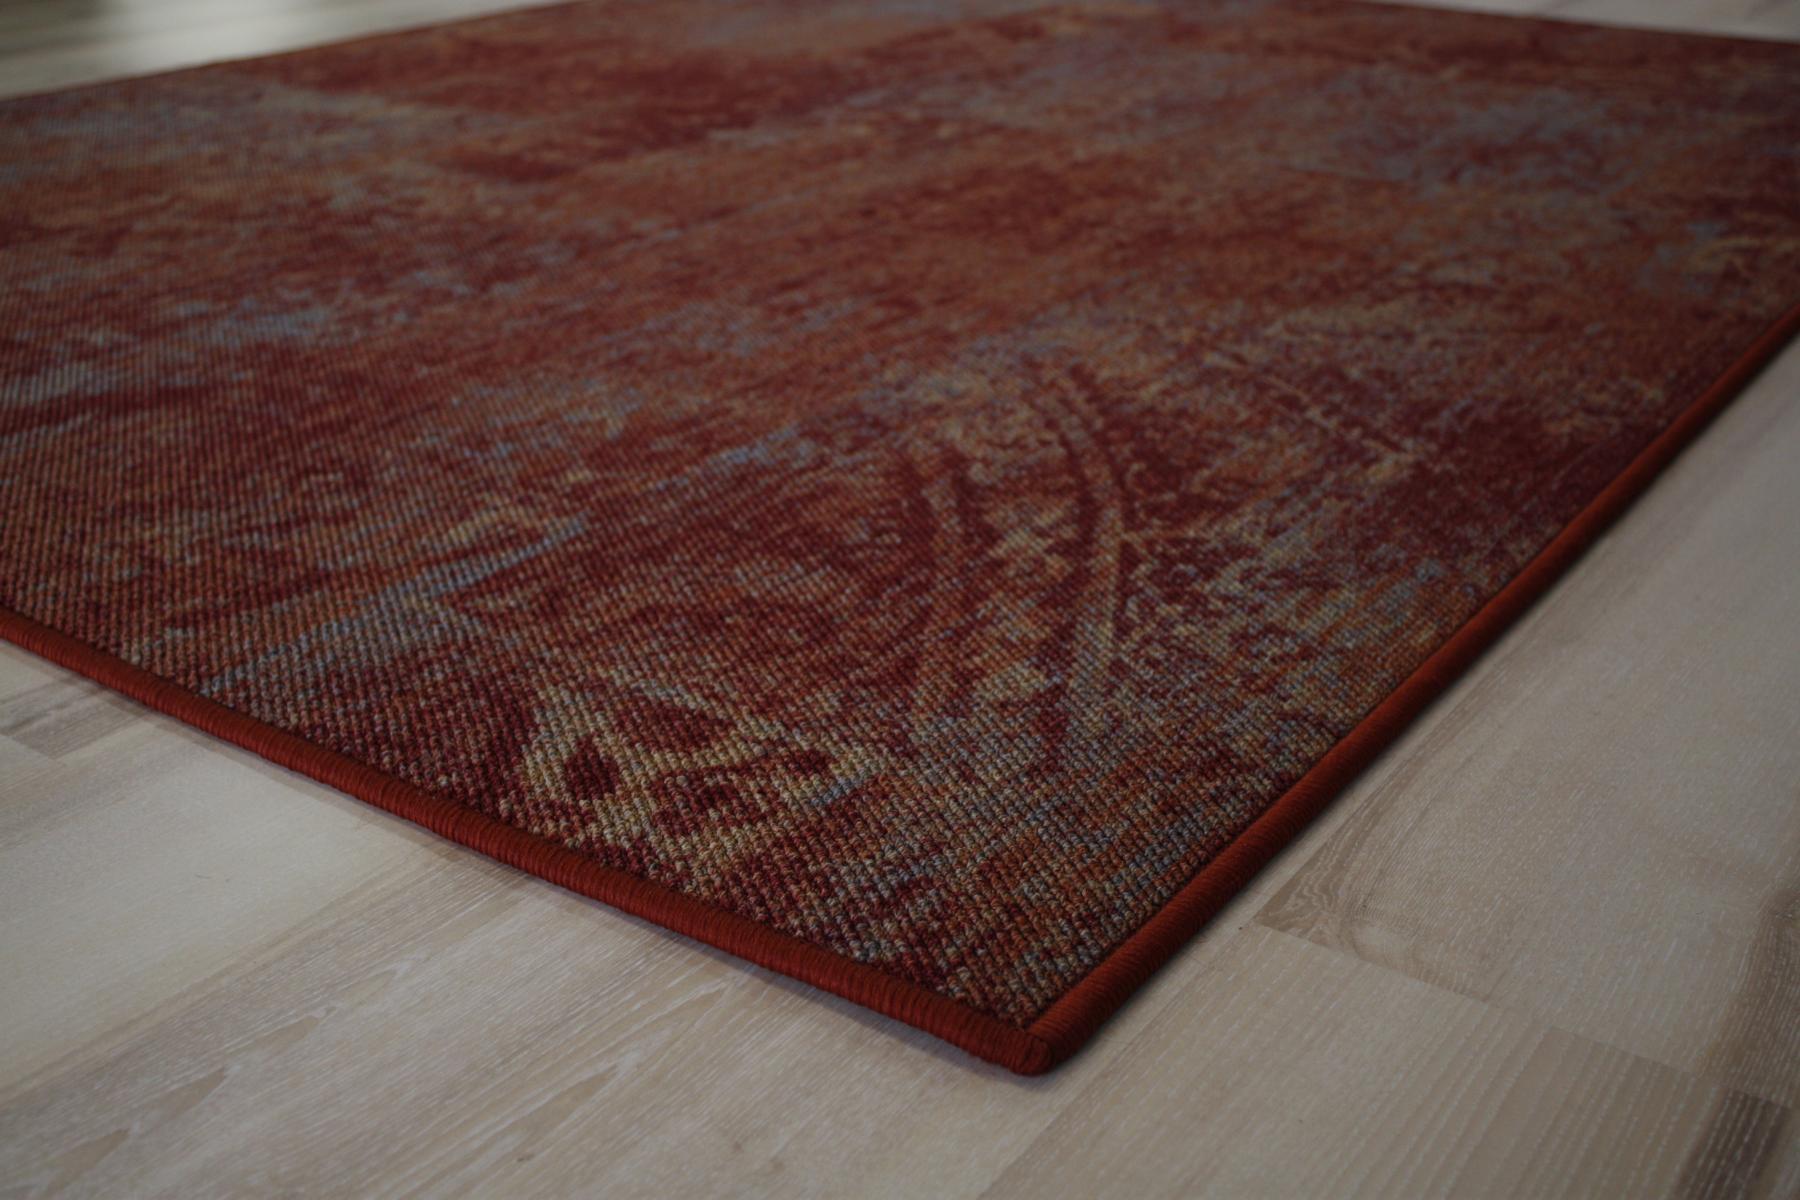 patchwork teppich teppichboden rot 200x200 cm billerbeck. Black Bedroom Furniture Sets. Home Design Ideas